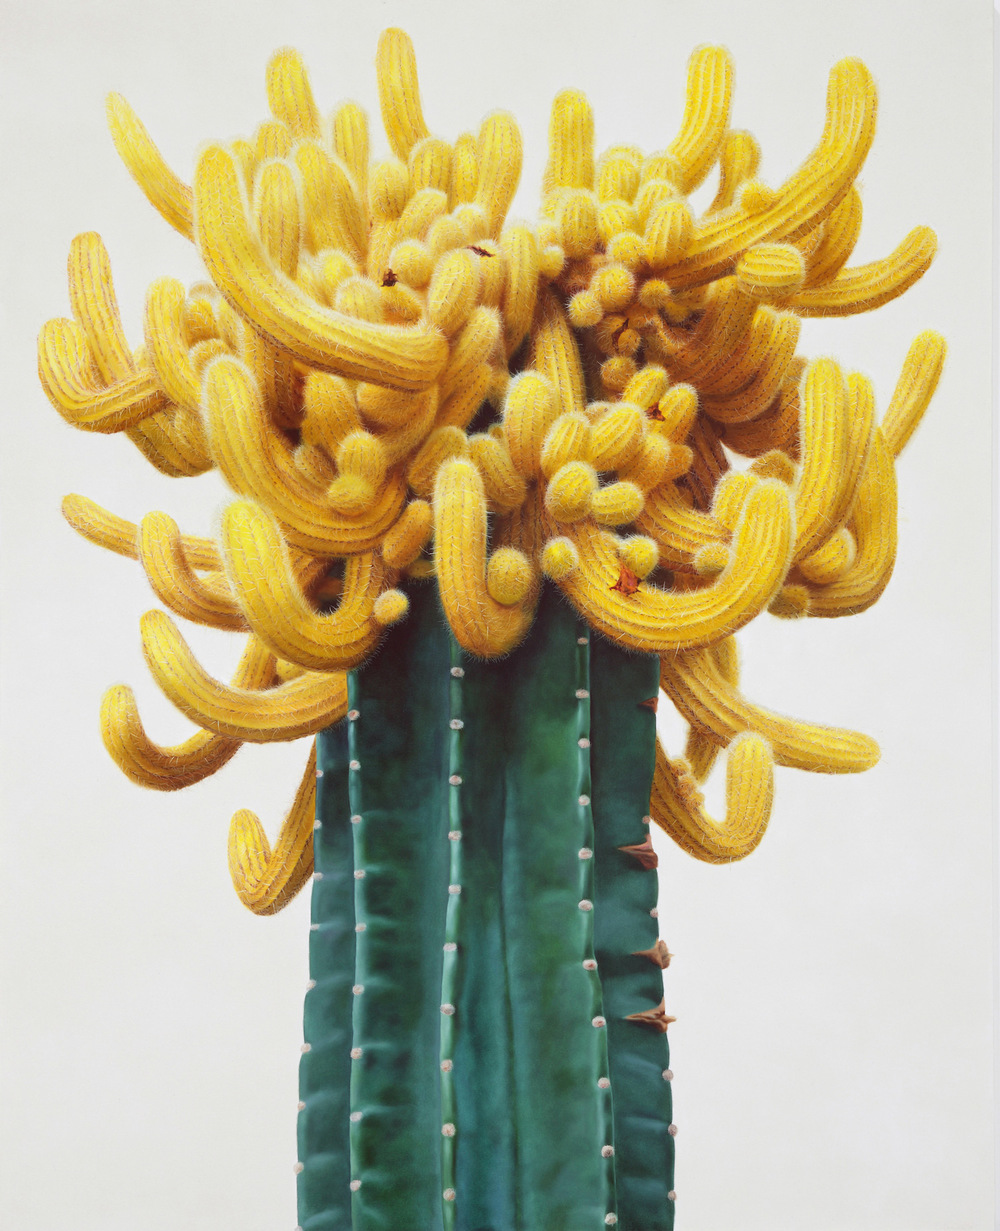 a4528-cactus-1.jpg